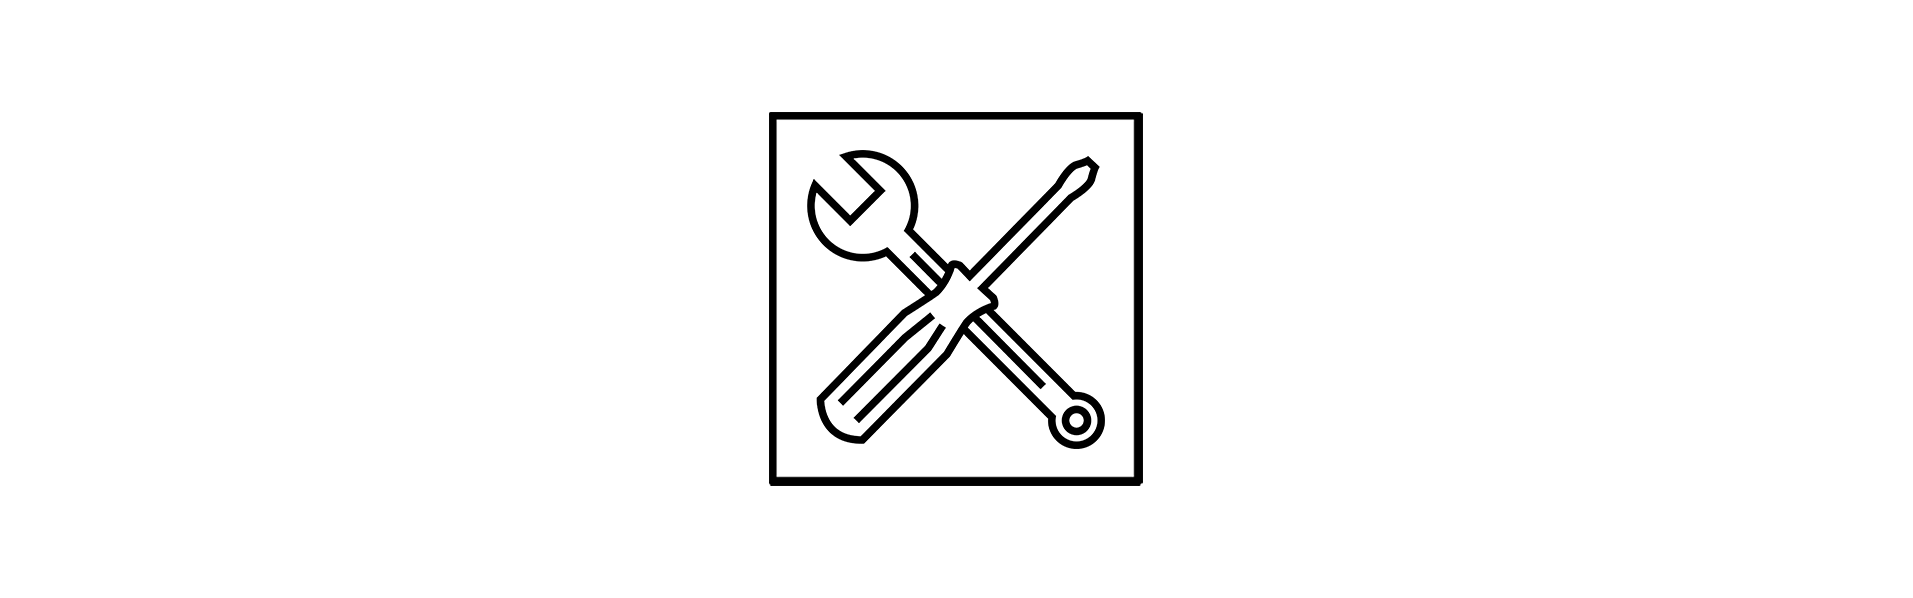 maintenance-smallest